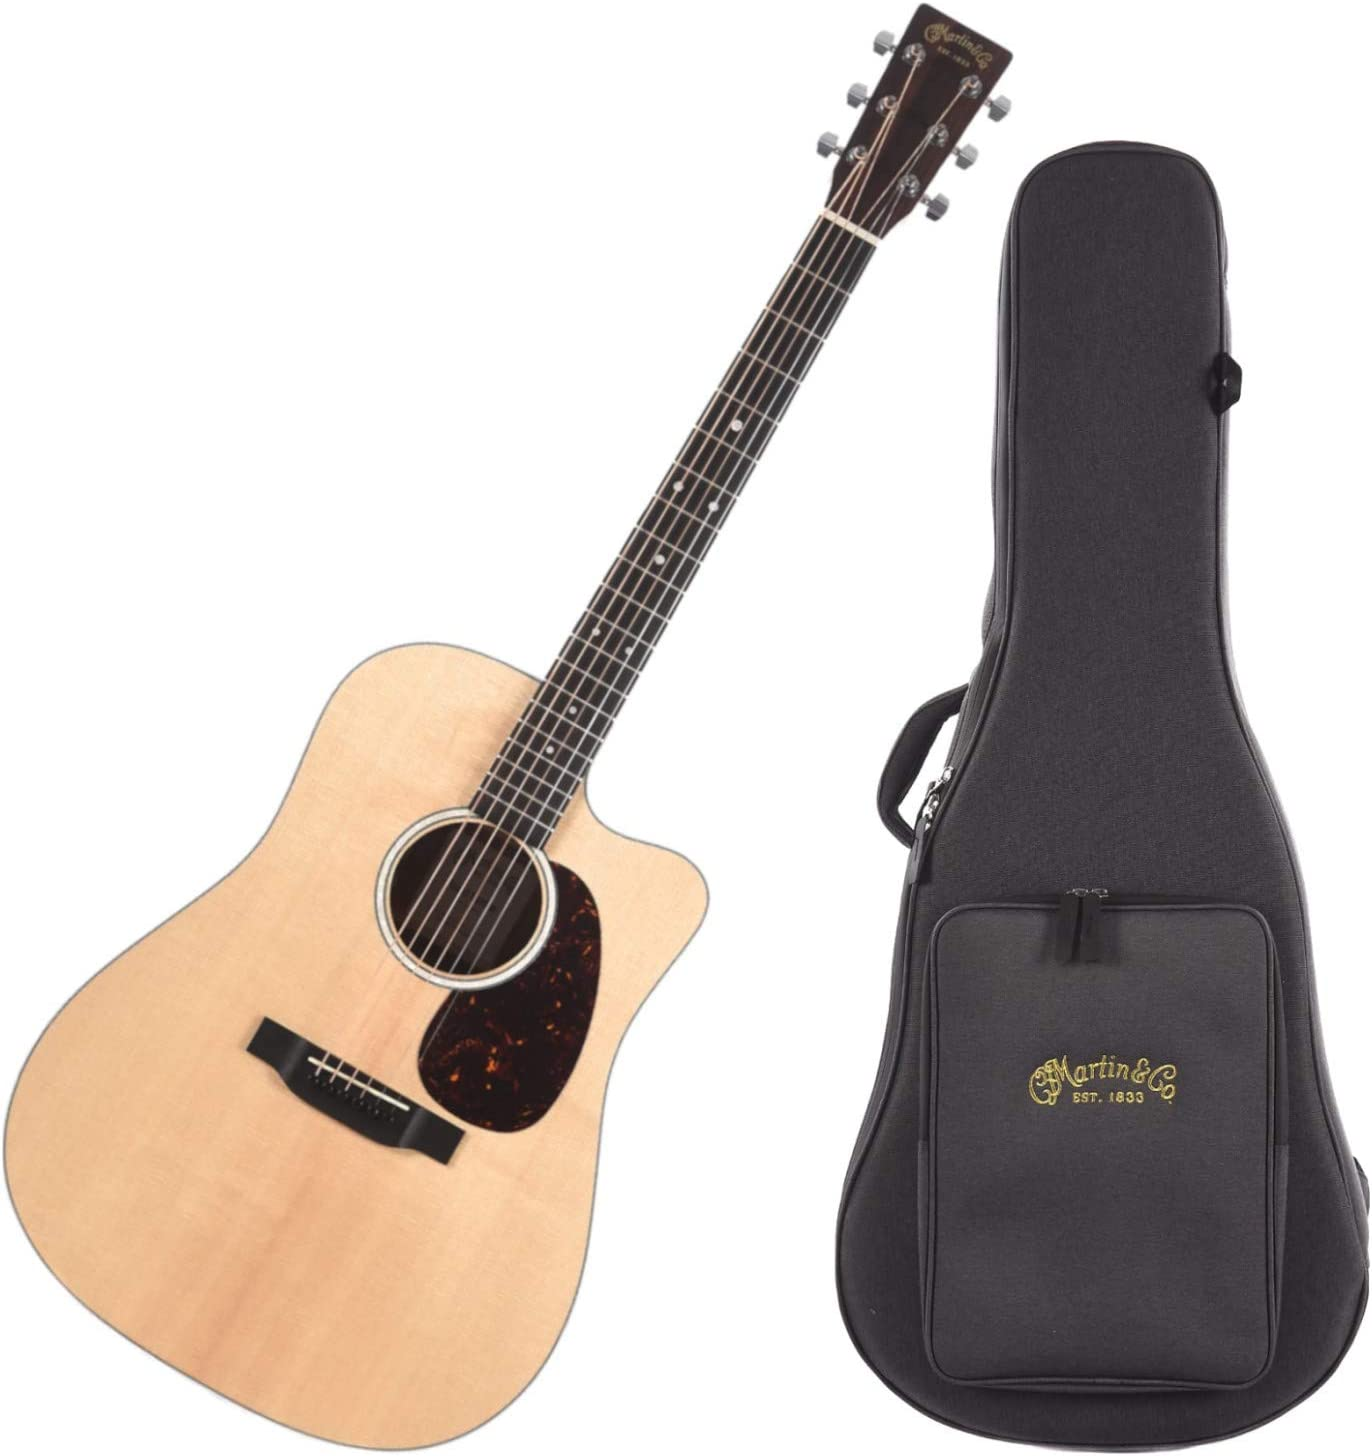 Martin DC-13E Road Series Guitarra acústica eléctrica: Amazon.es ...